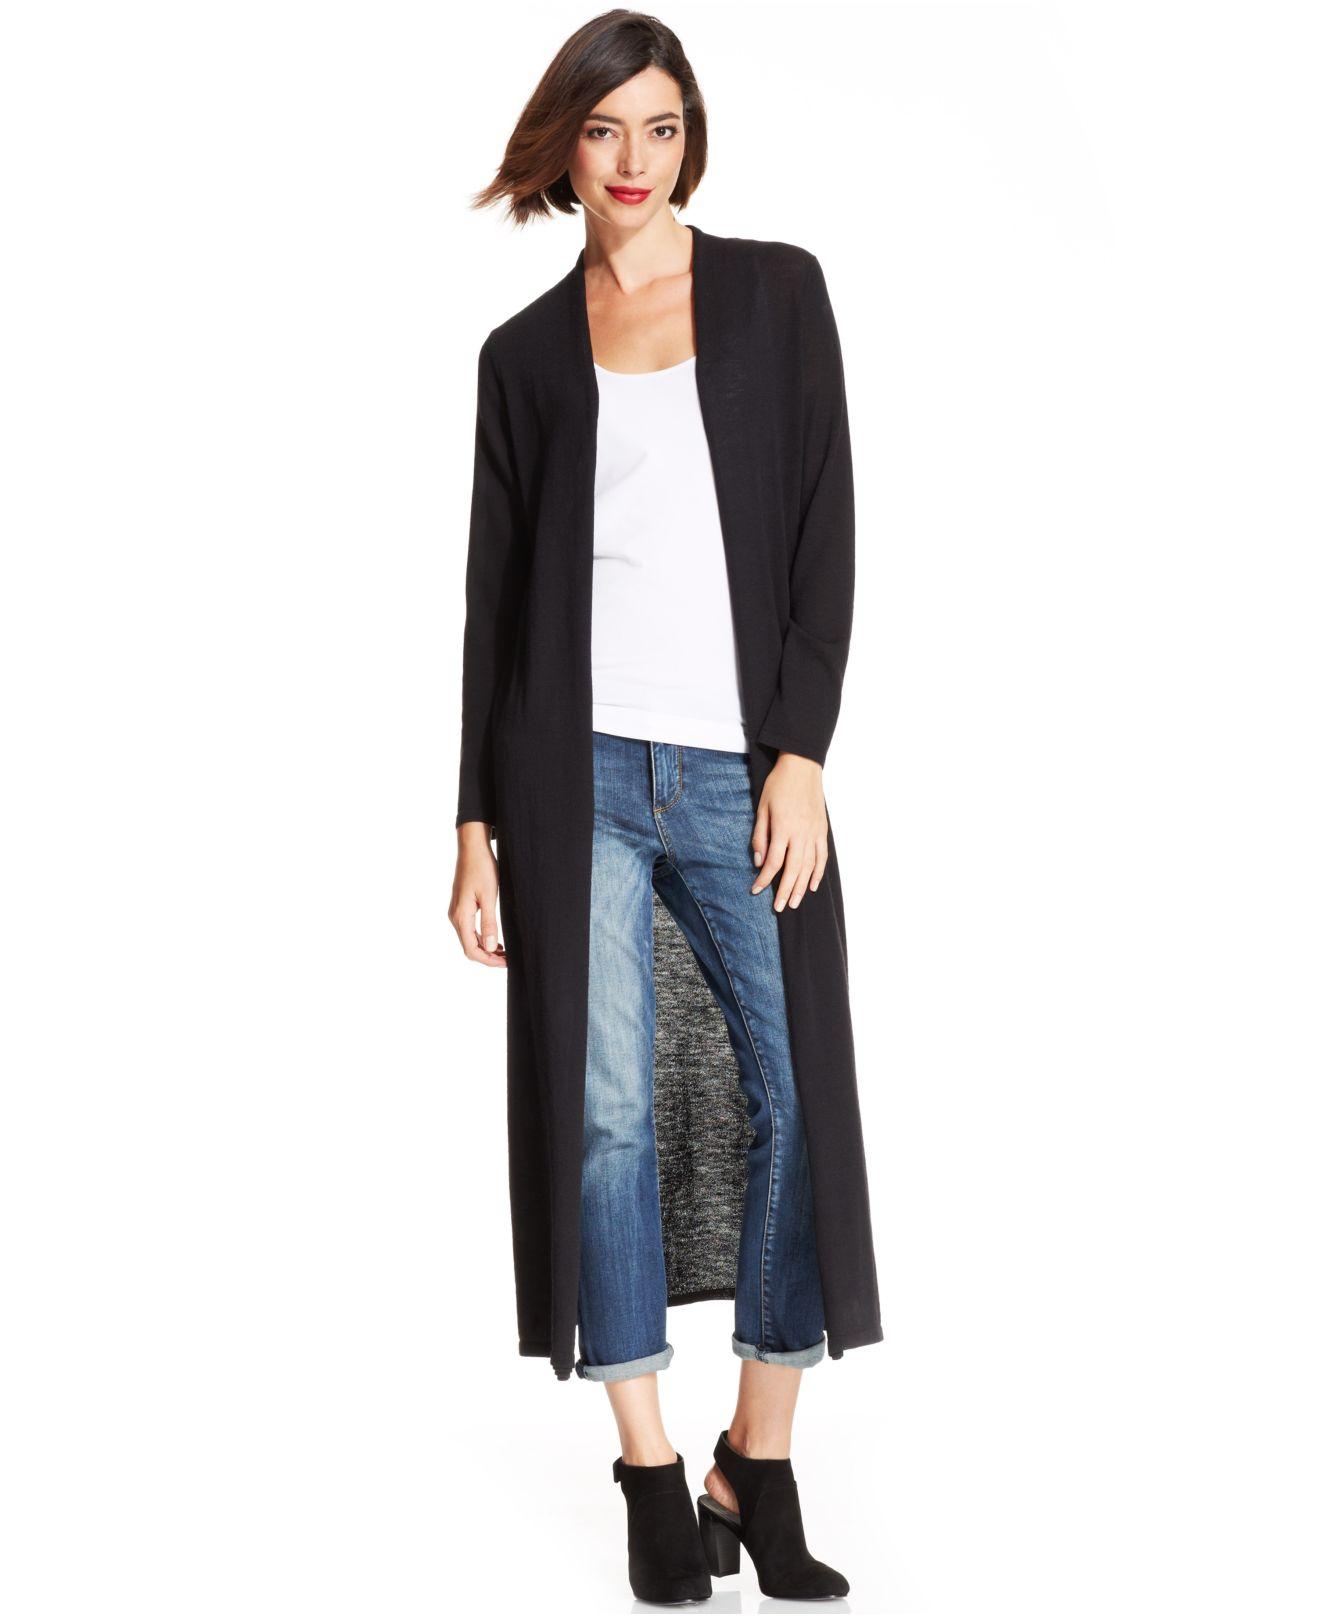 Eileen fisher Merino-Wool Maxi Cardigan in Black   Lyst